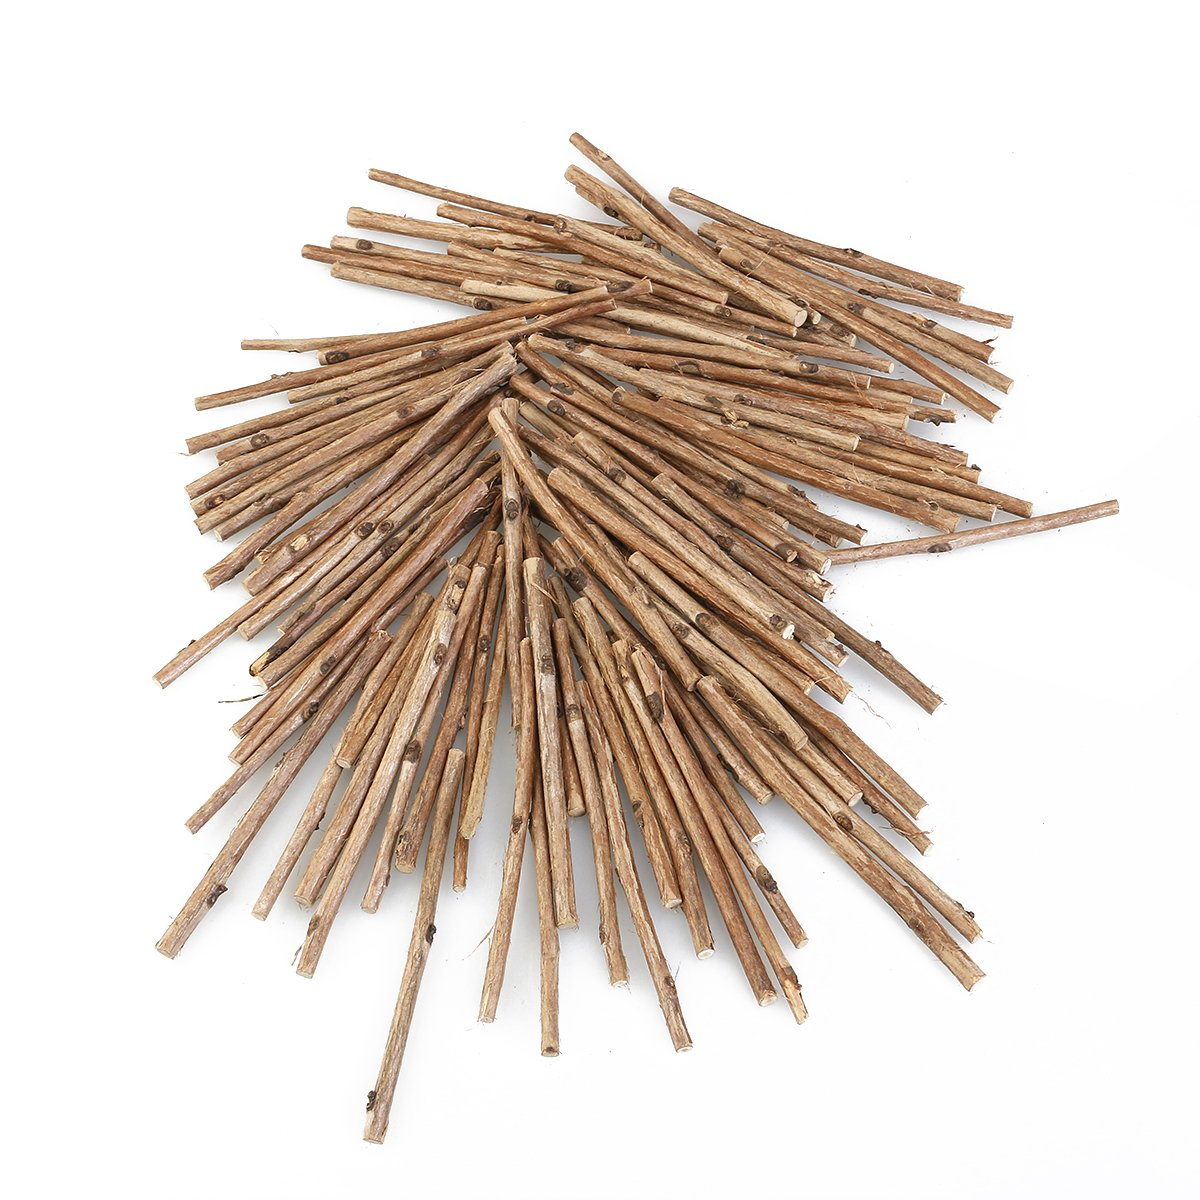 WINOMO 100pcs Wood Log Sticks for DIY Crafts 10CM Long 0.3-0.5CM in Diameter Wood Color